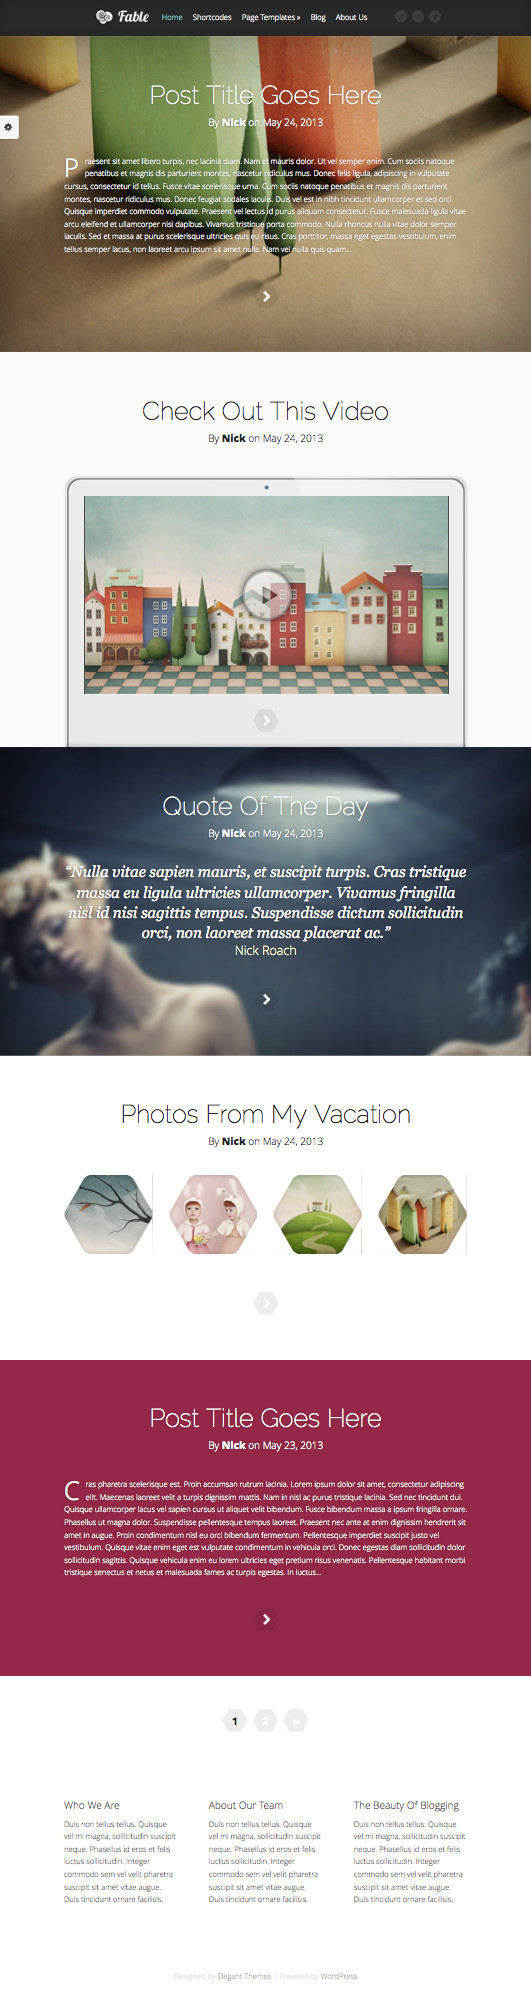 Fable WordPress Full-Screen Blog Theme